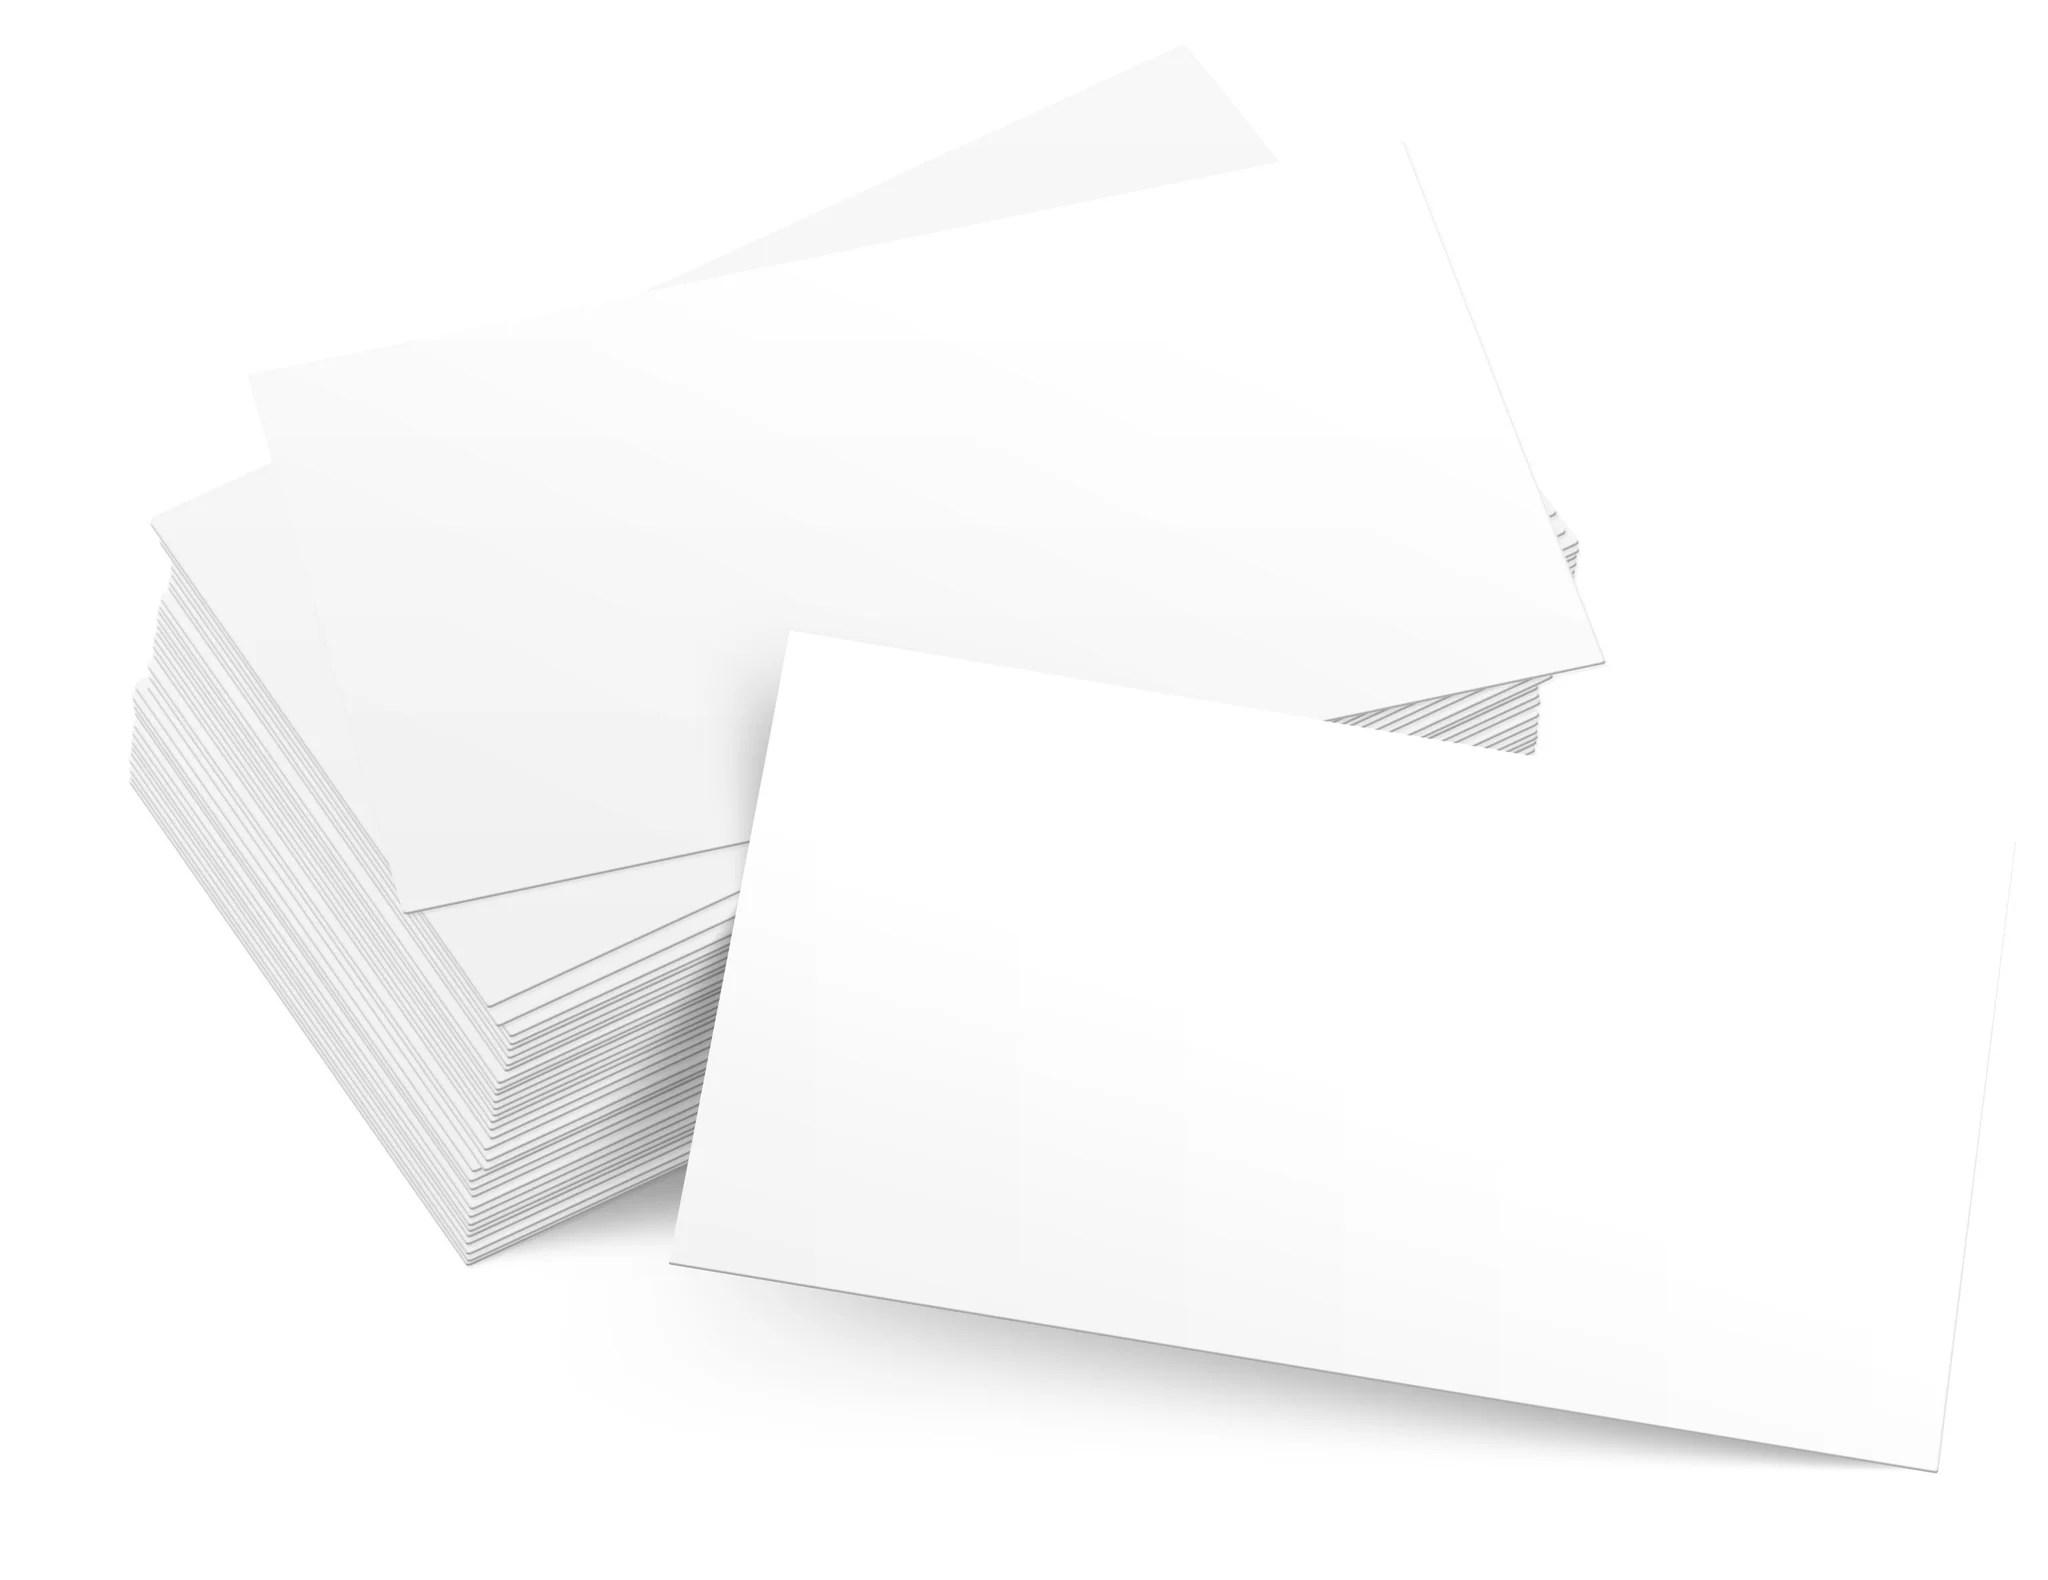 blank remittance envelopes